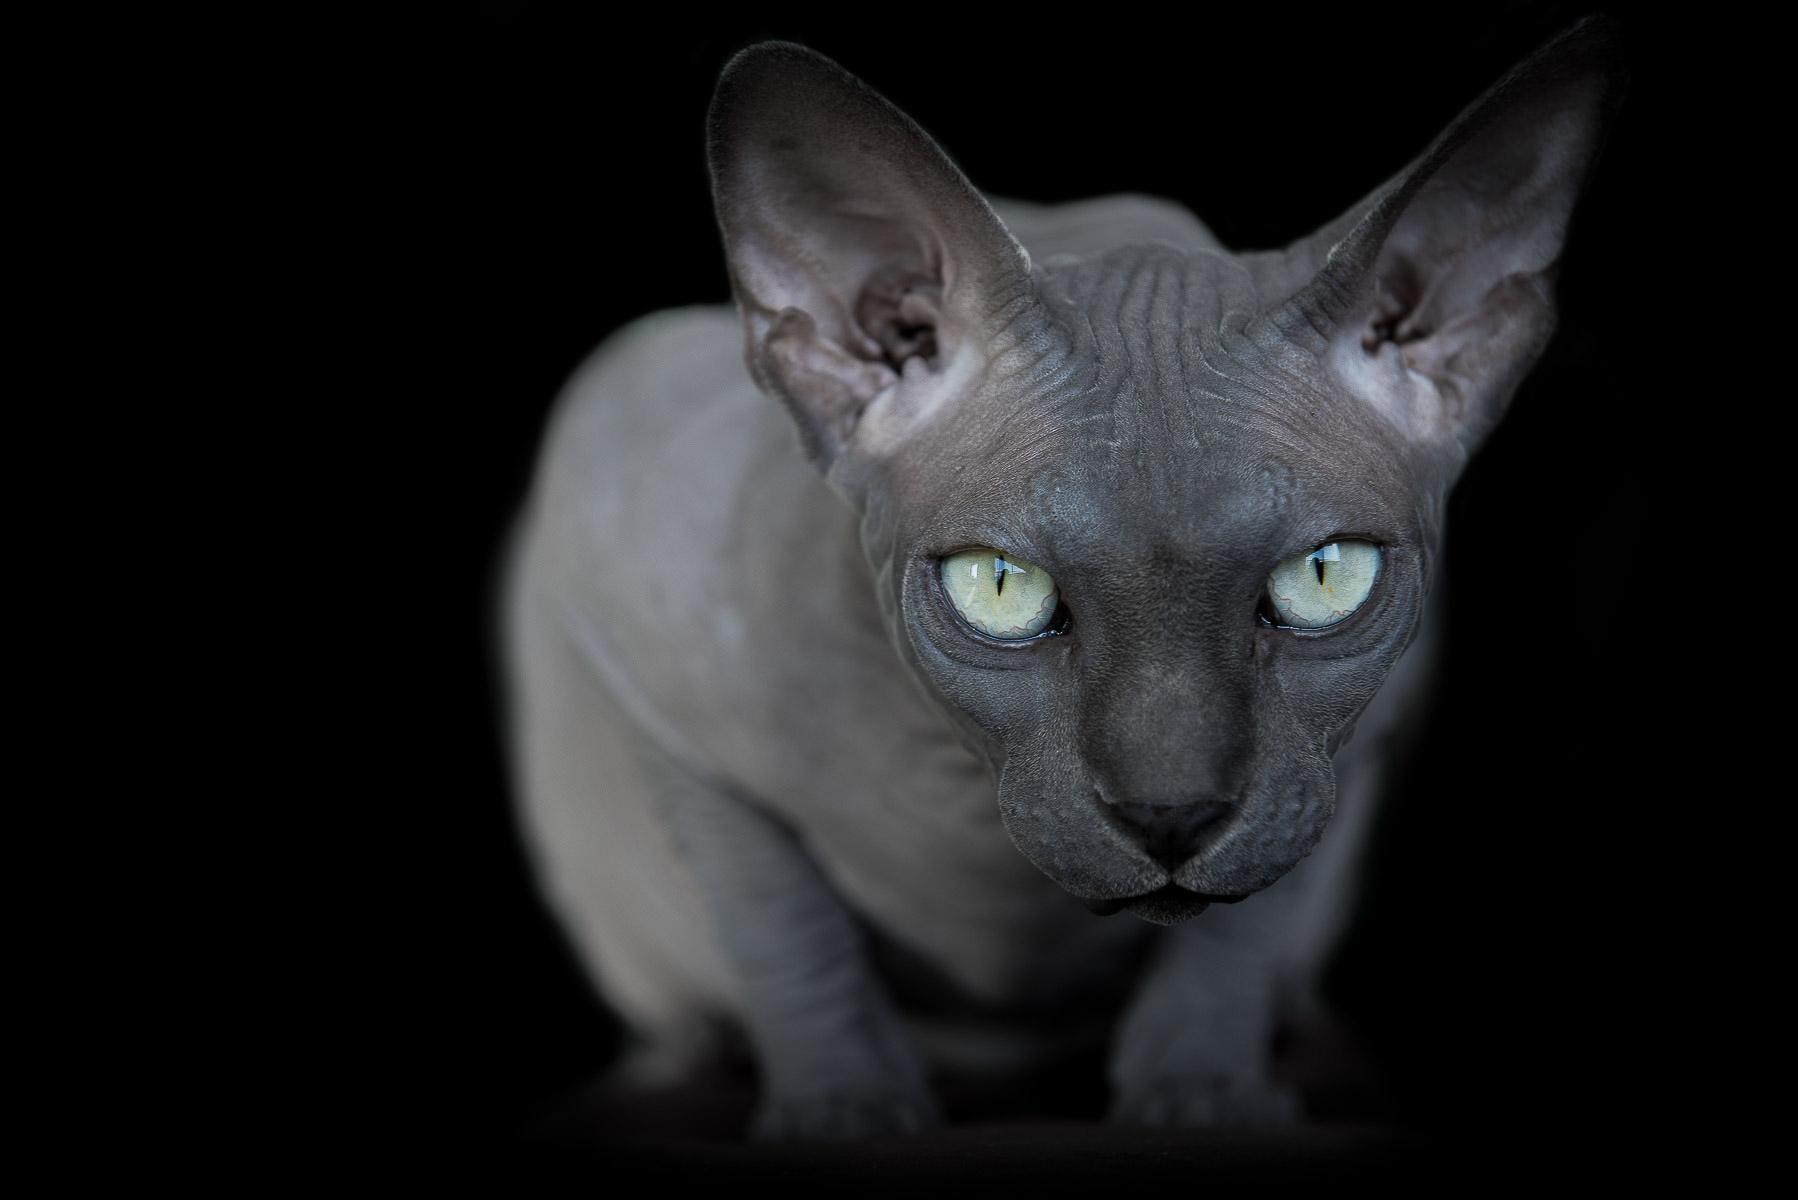 sphynx-cat-photos-by-alicia-rius-11.jpg